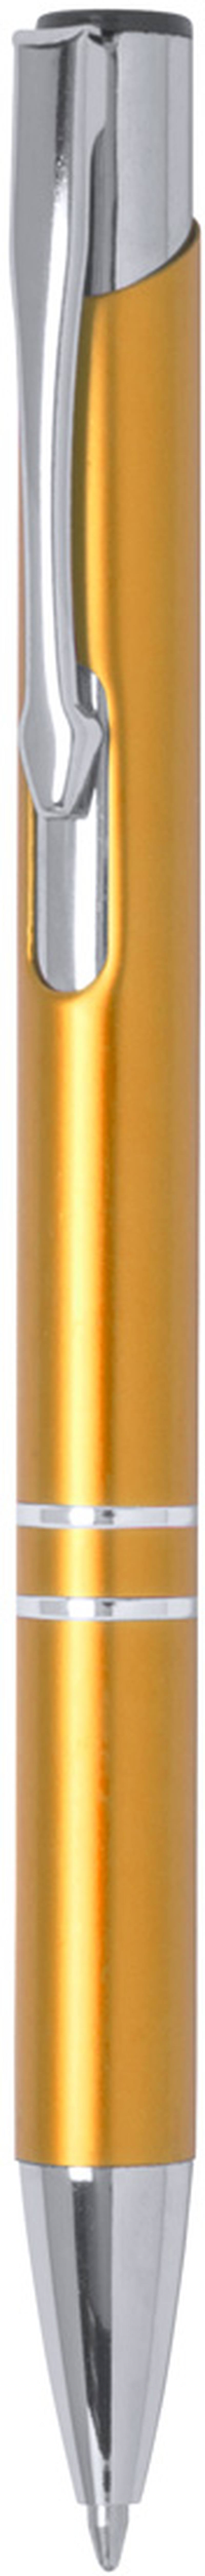 Kuličkové pero Trocum